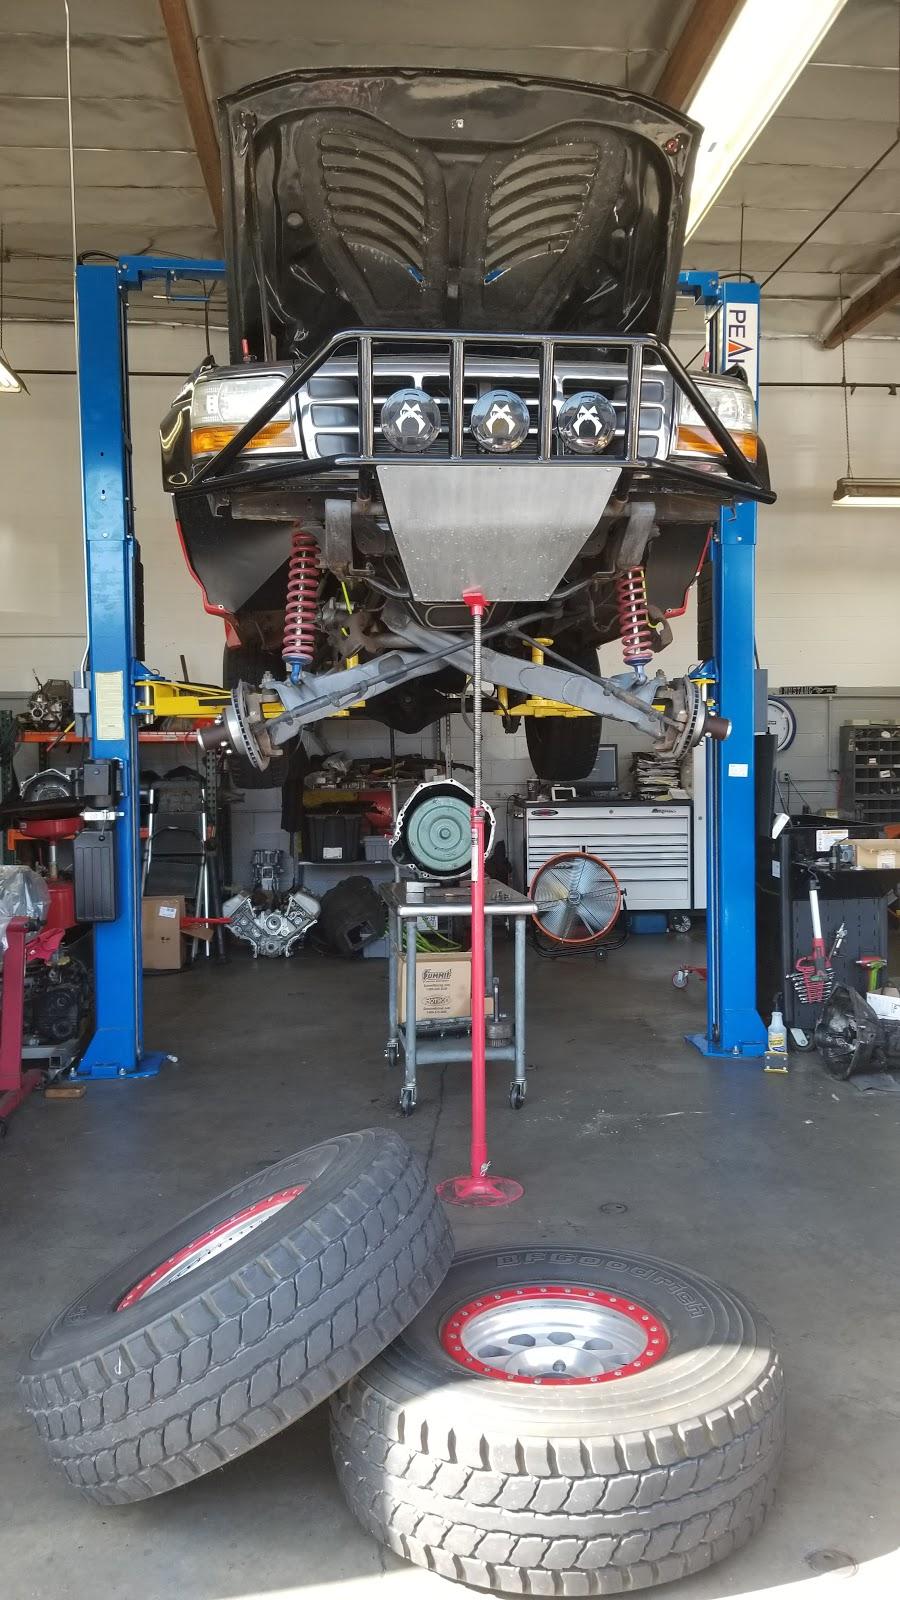 Speedworx Automotive - car repair  | Photo 6 of 7 | Address: 1448-1450 Ranger Dr, Covina, CA 91722, USA | Phone: (626) 434-6860